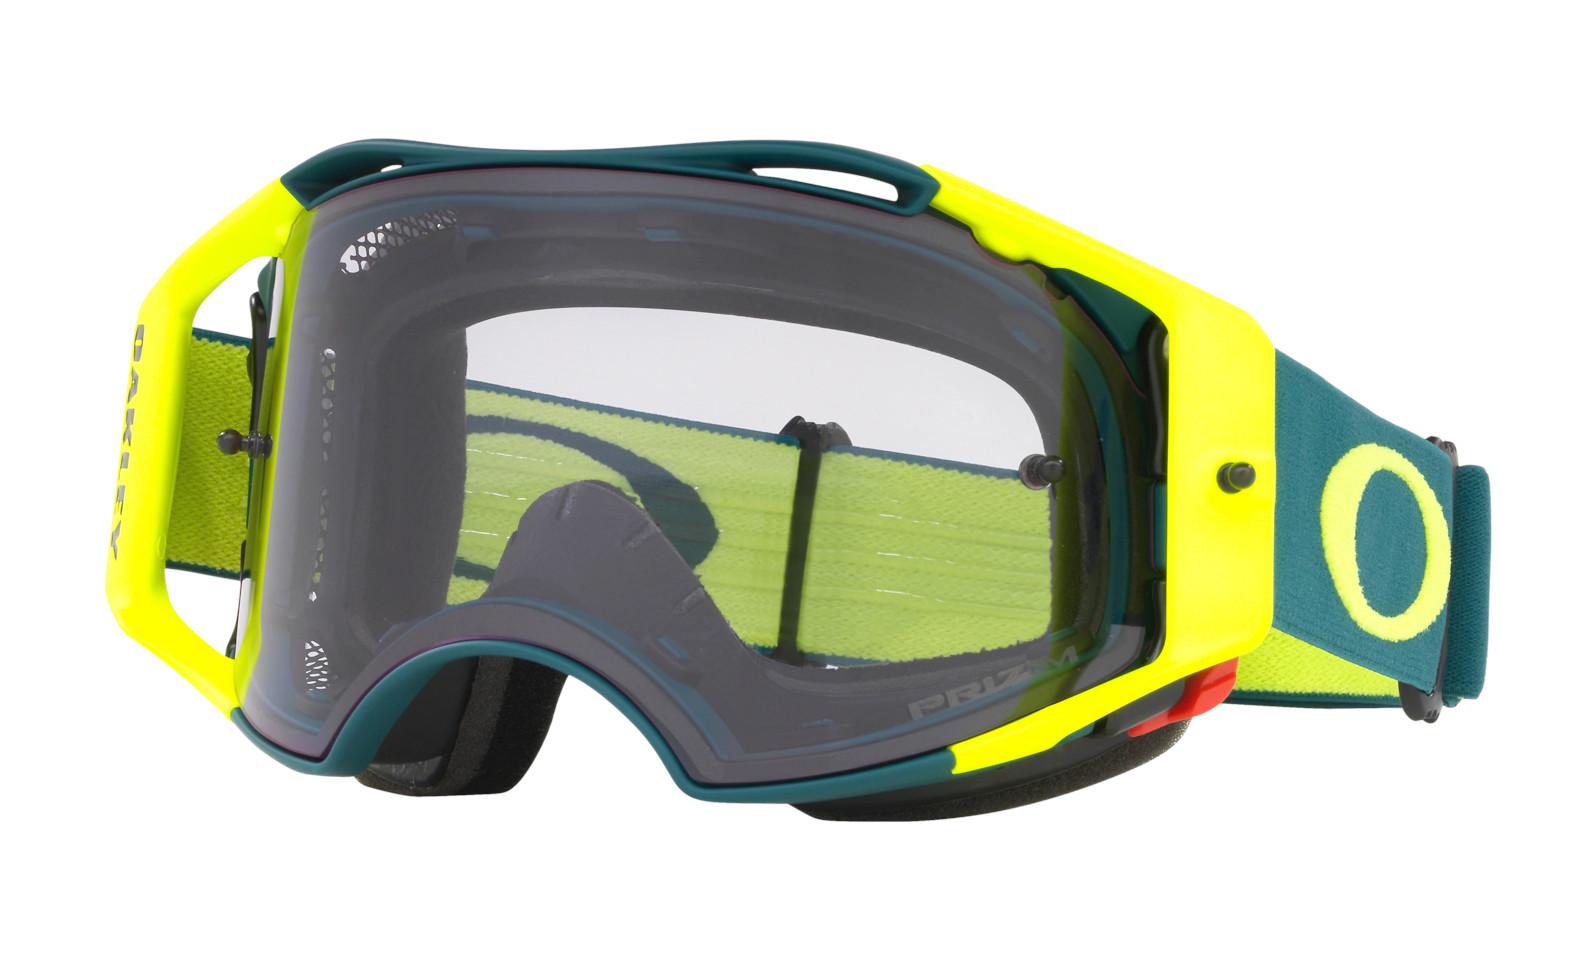 Oakley Airbrake MTB Goggles - Balsam Retina frame, Prizm Low Light lens